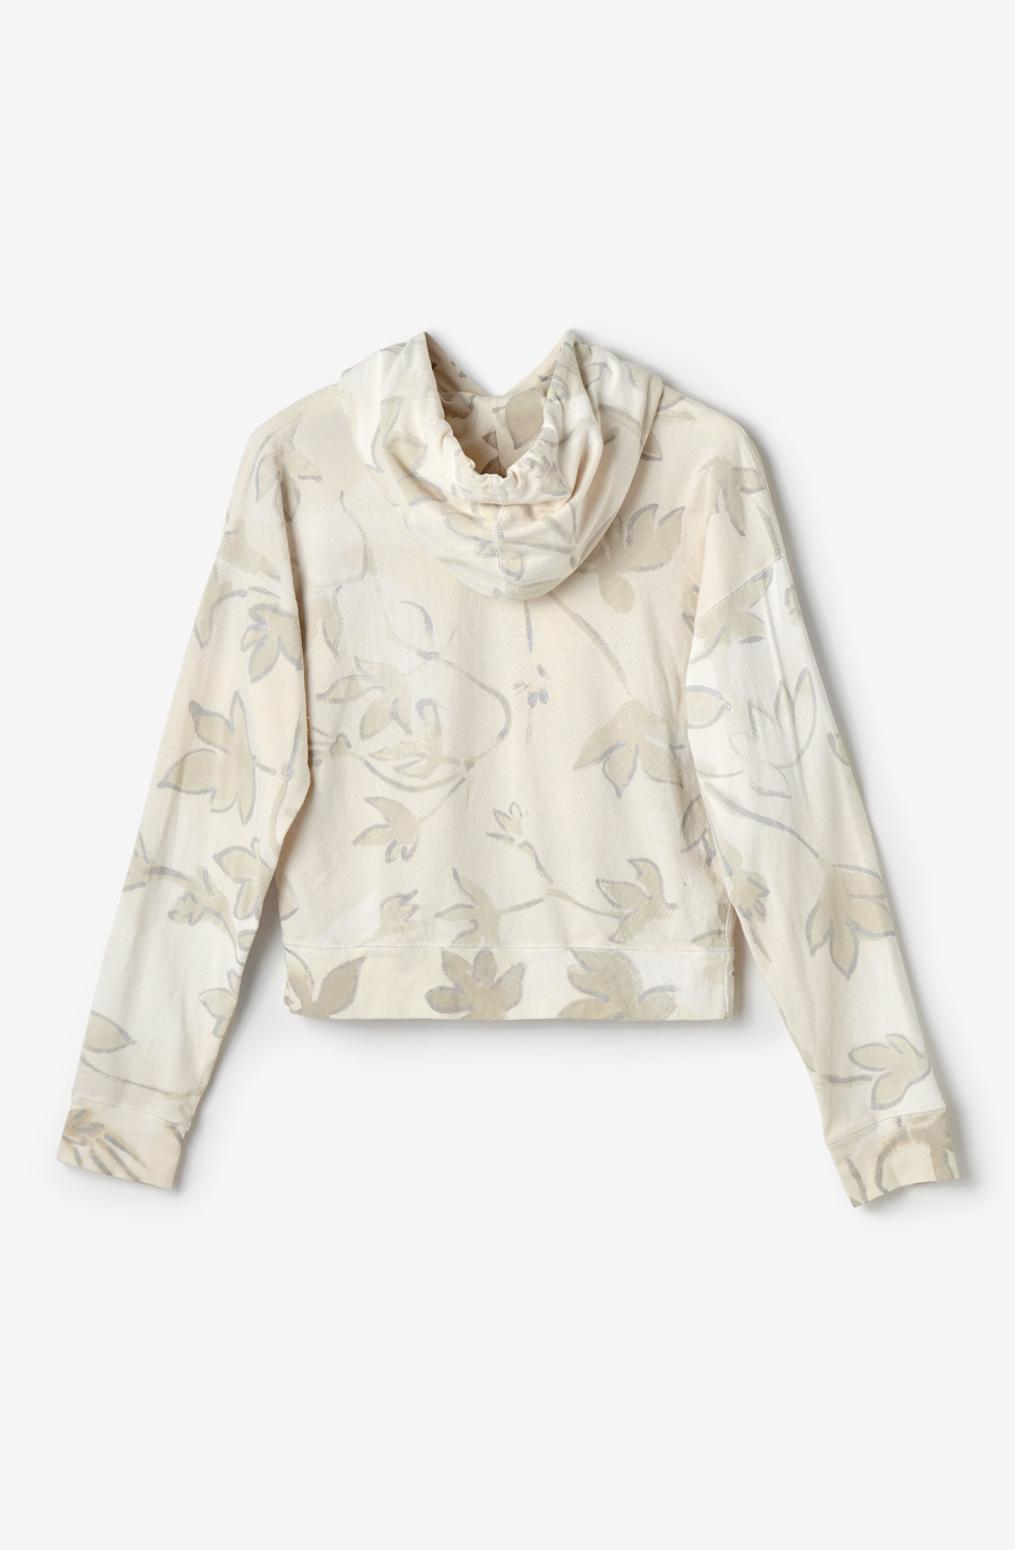 Alabama chanin womens organic cotton floral hoodie leisurewear 2